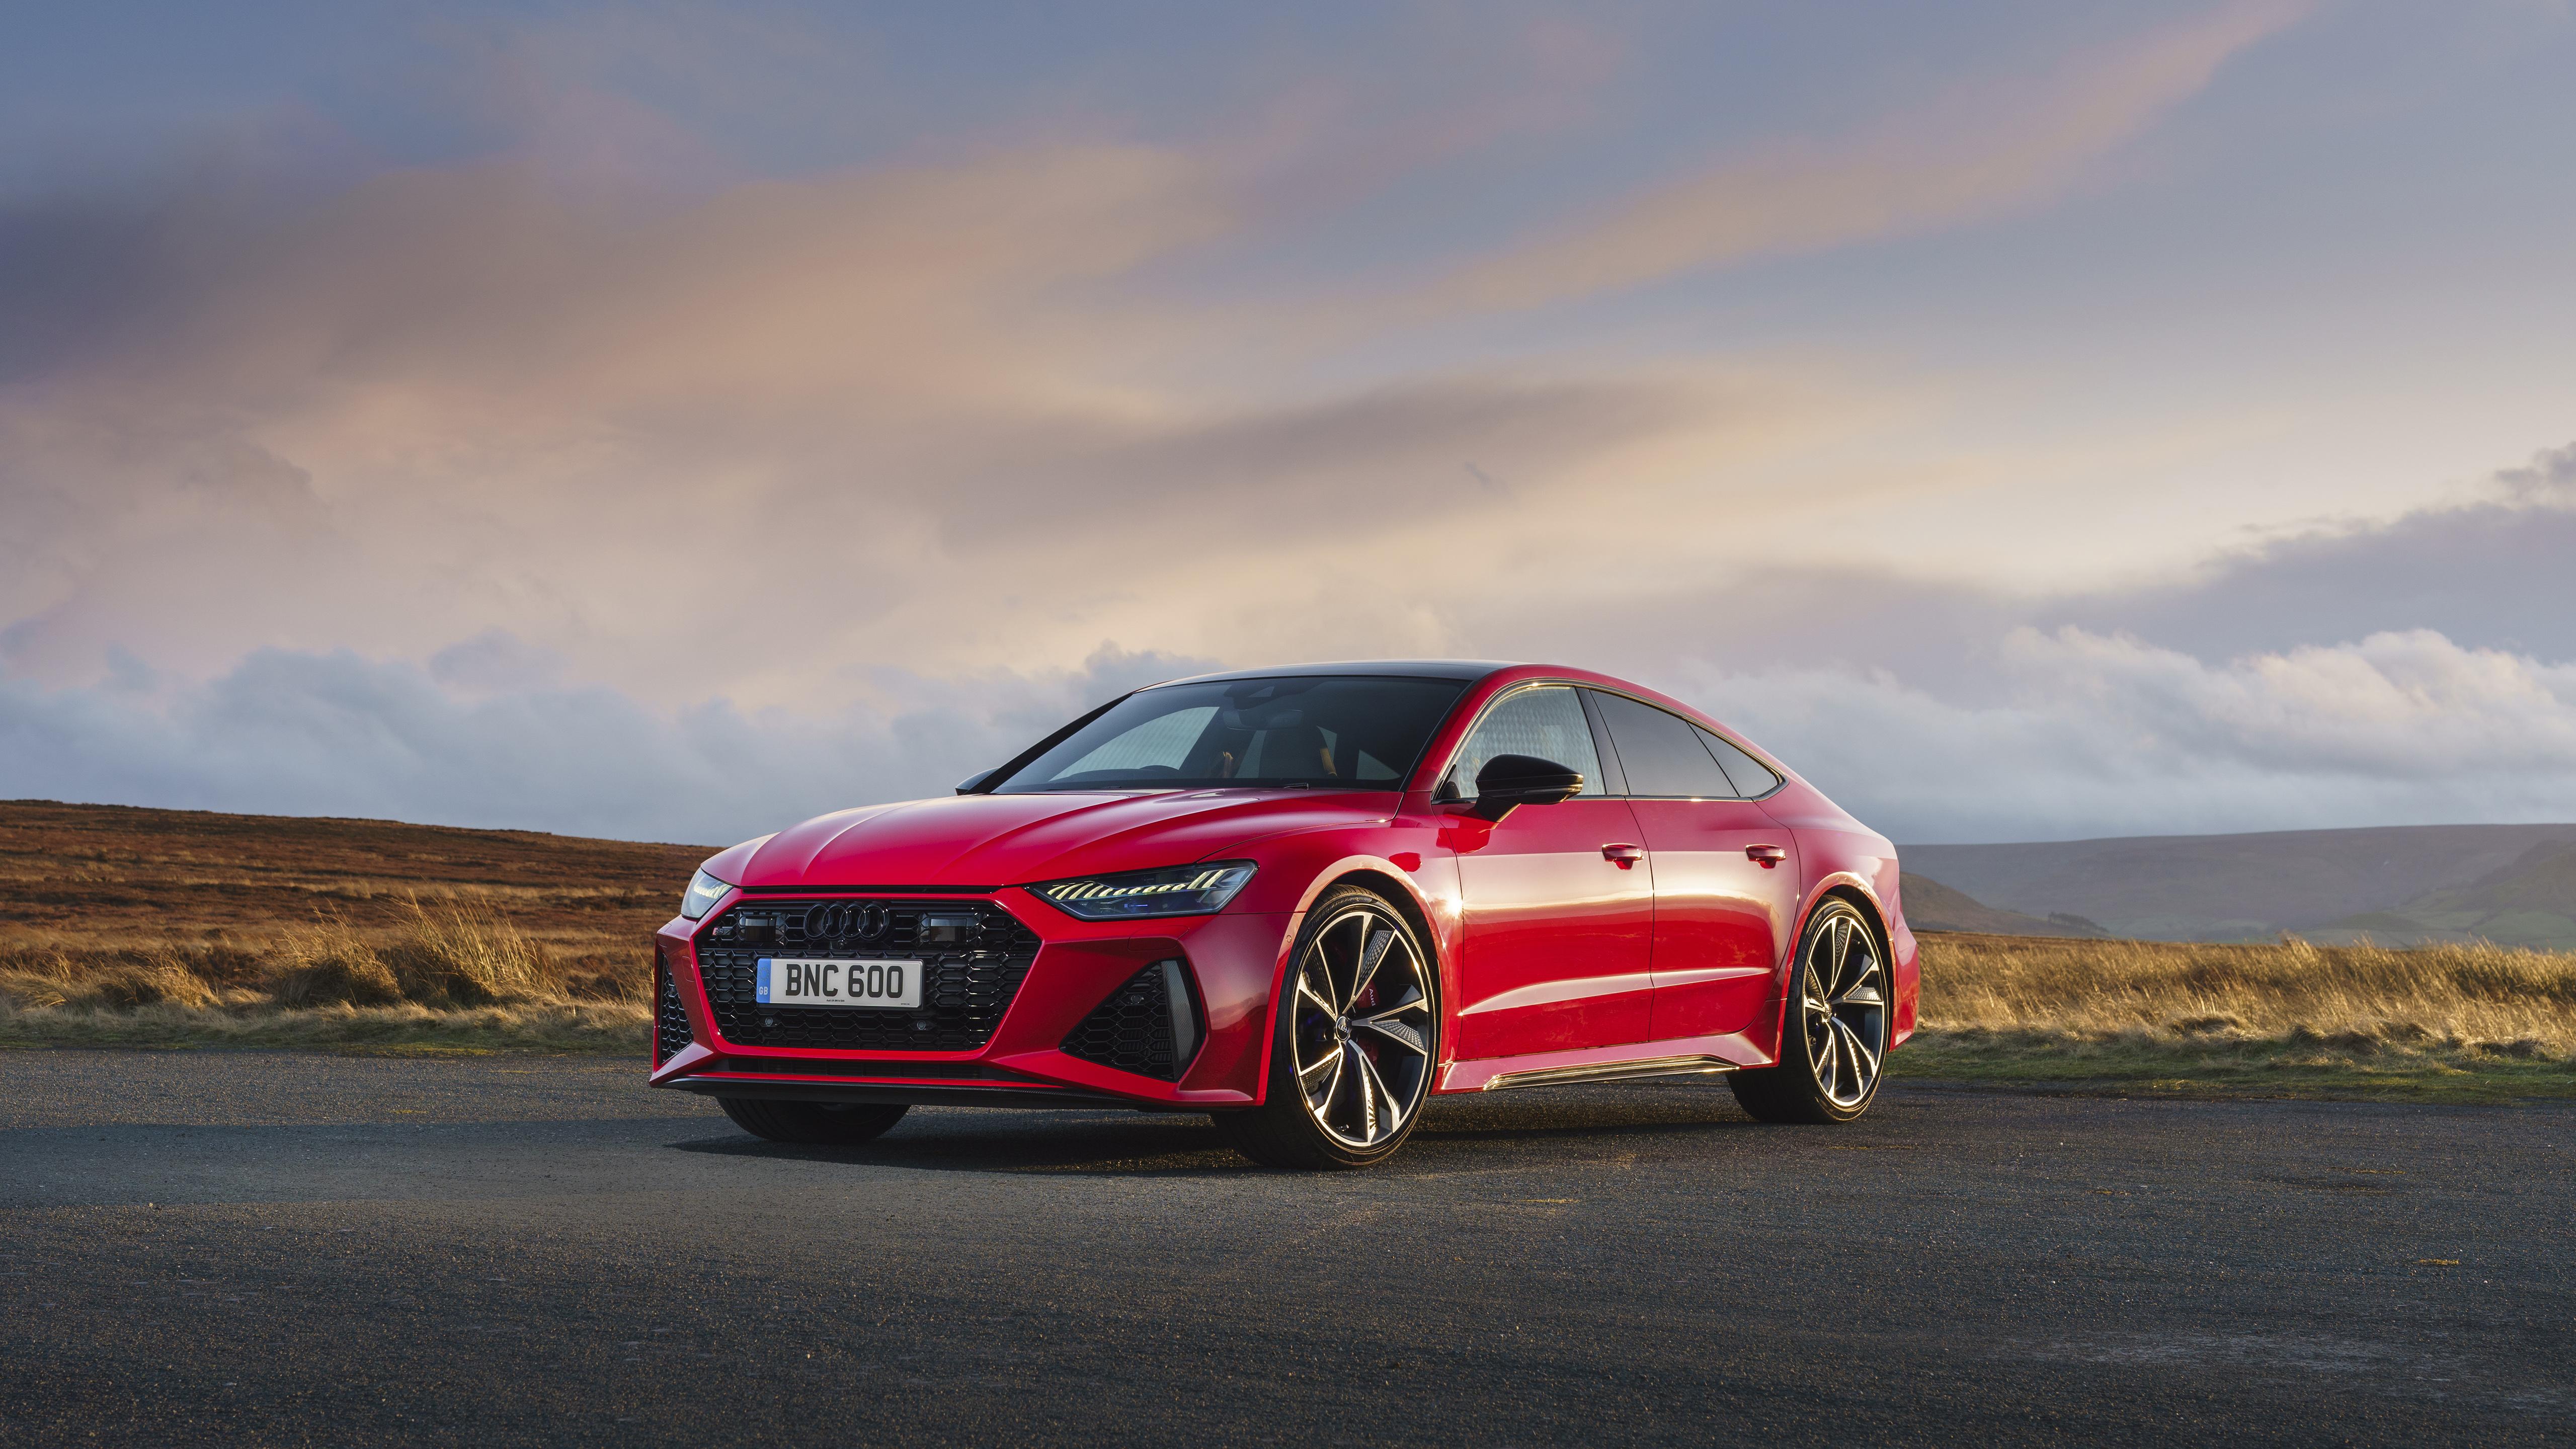 Audi Rs 7 Sportback 2020 5k 2 Wallpaper Hd Car Wallpapers Id 14461